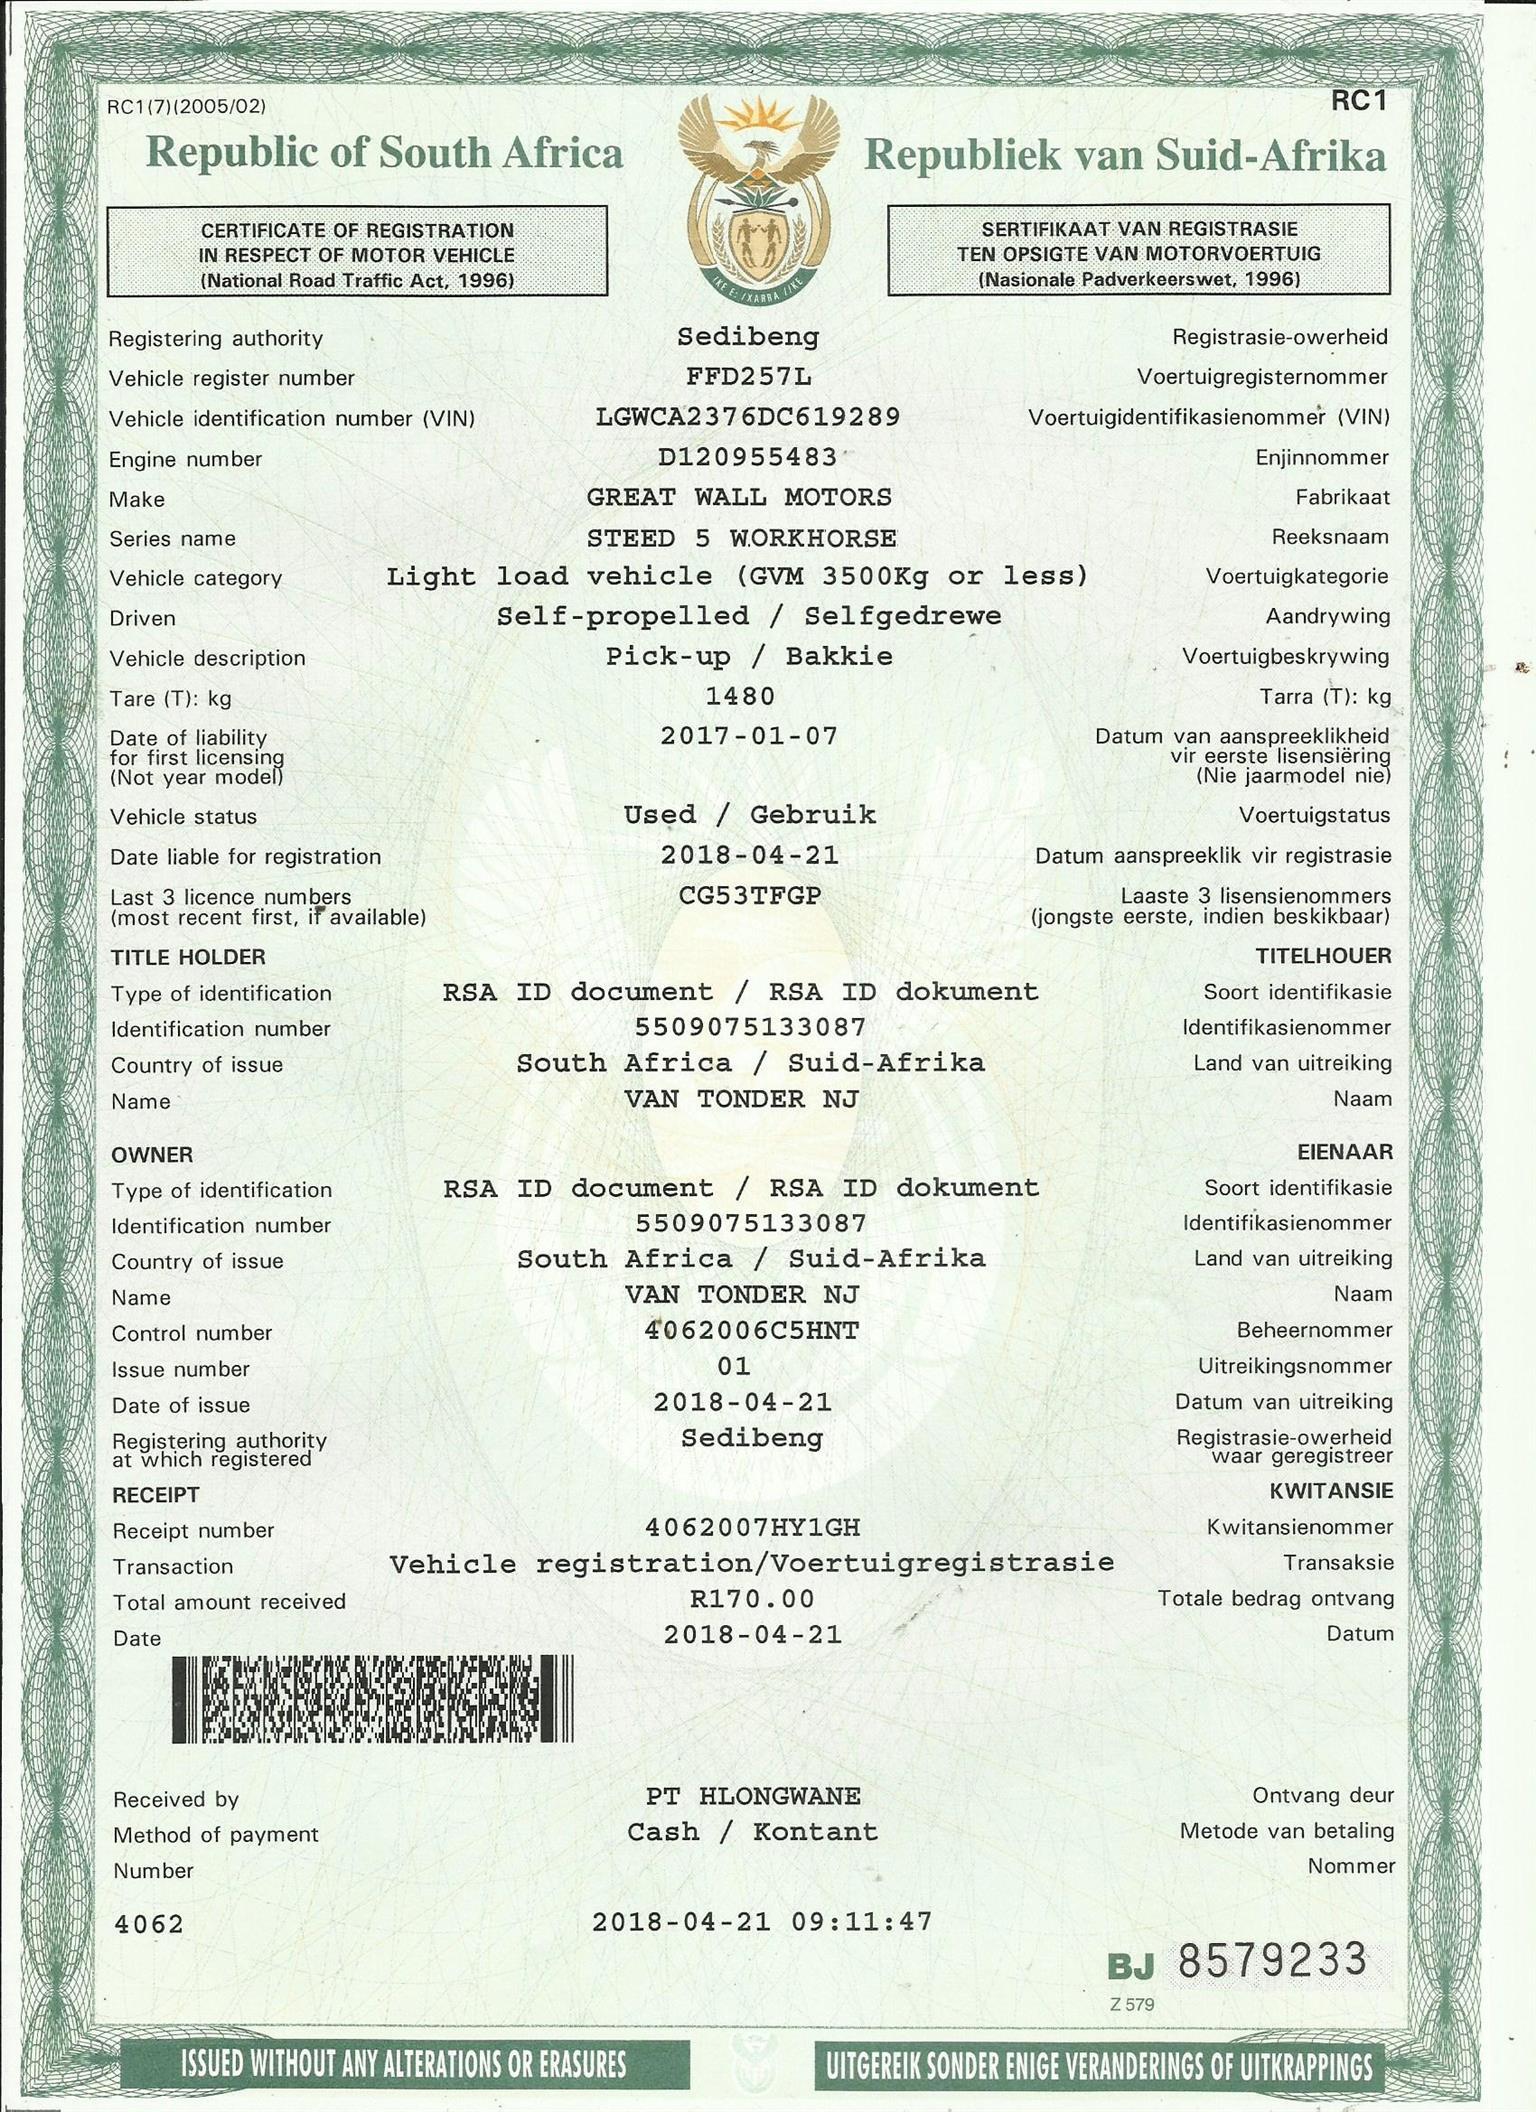 2013 GWM Steed 5 single cab STEED 5 2.2 MPi WORKHORSE P/U S/C